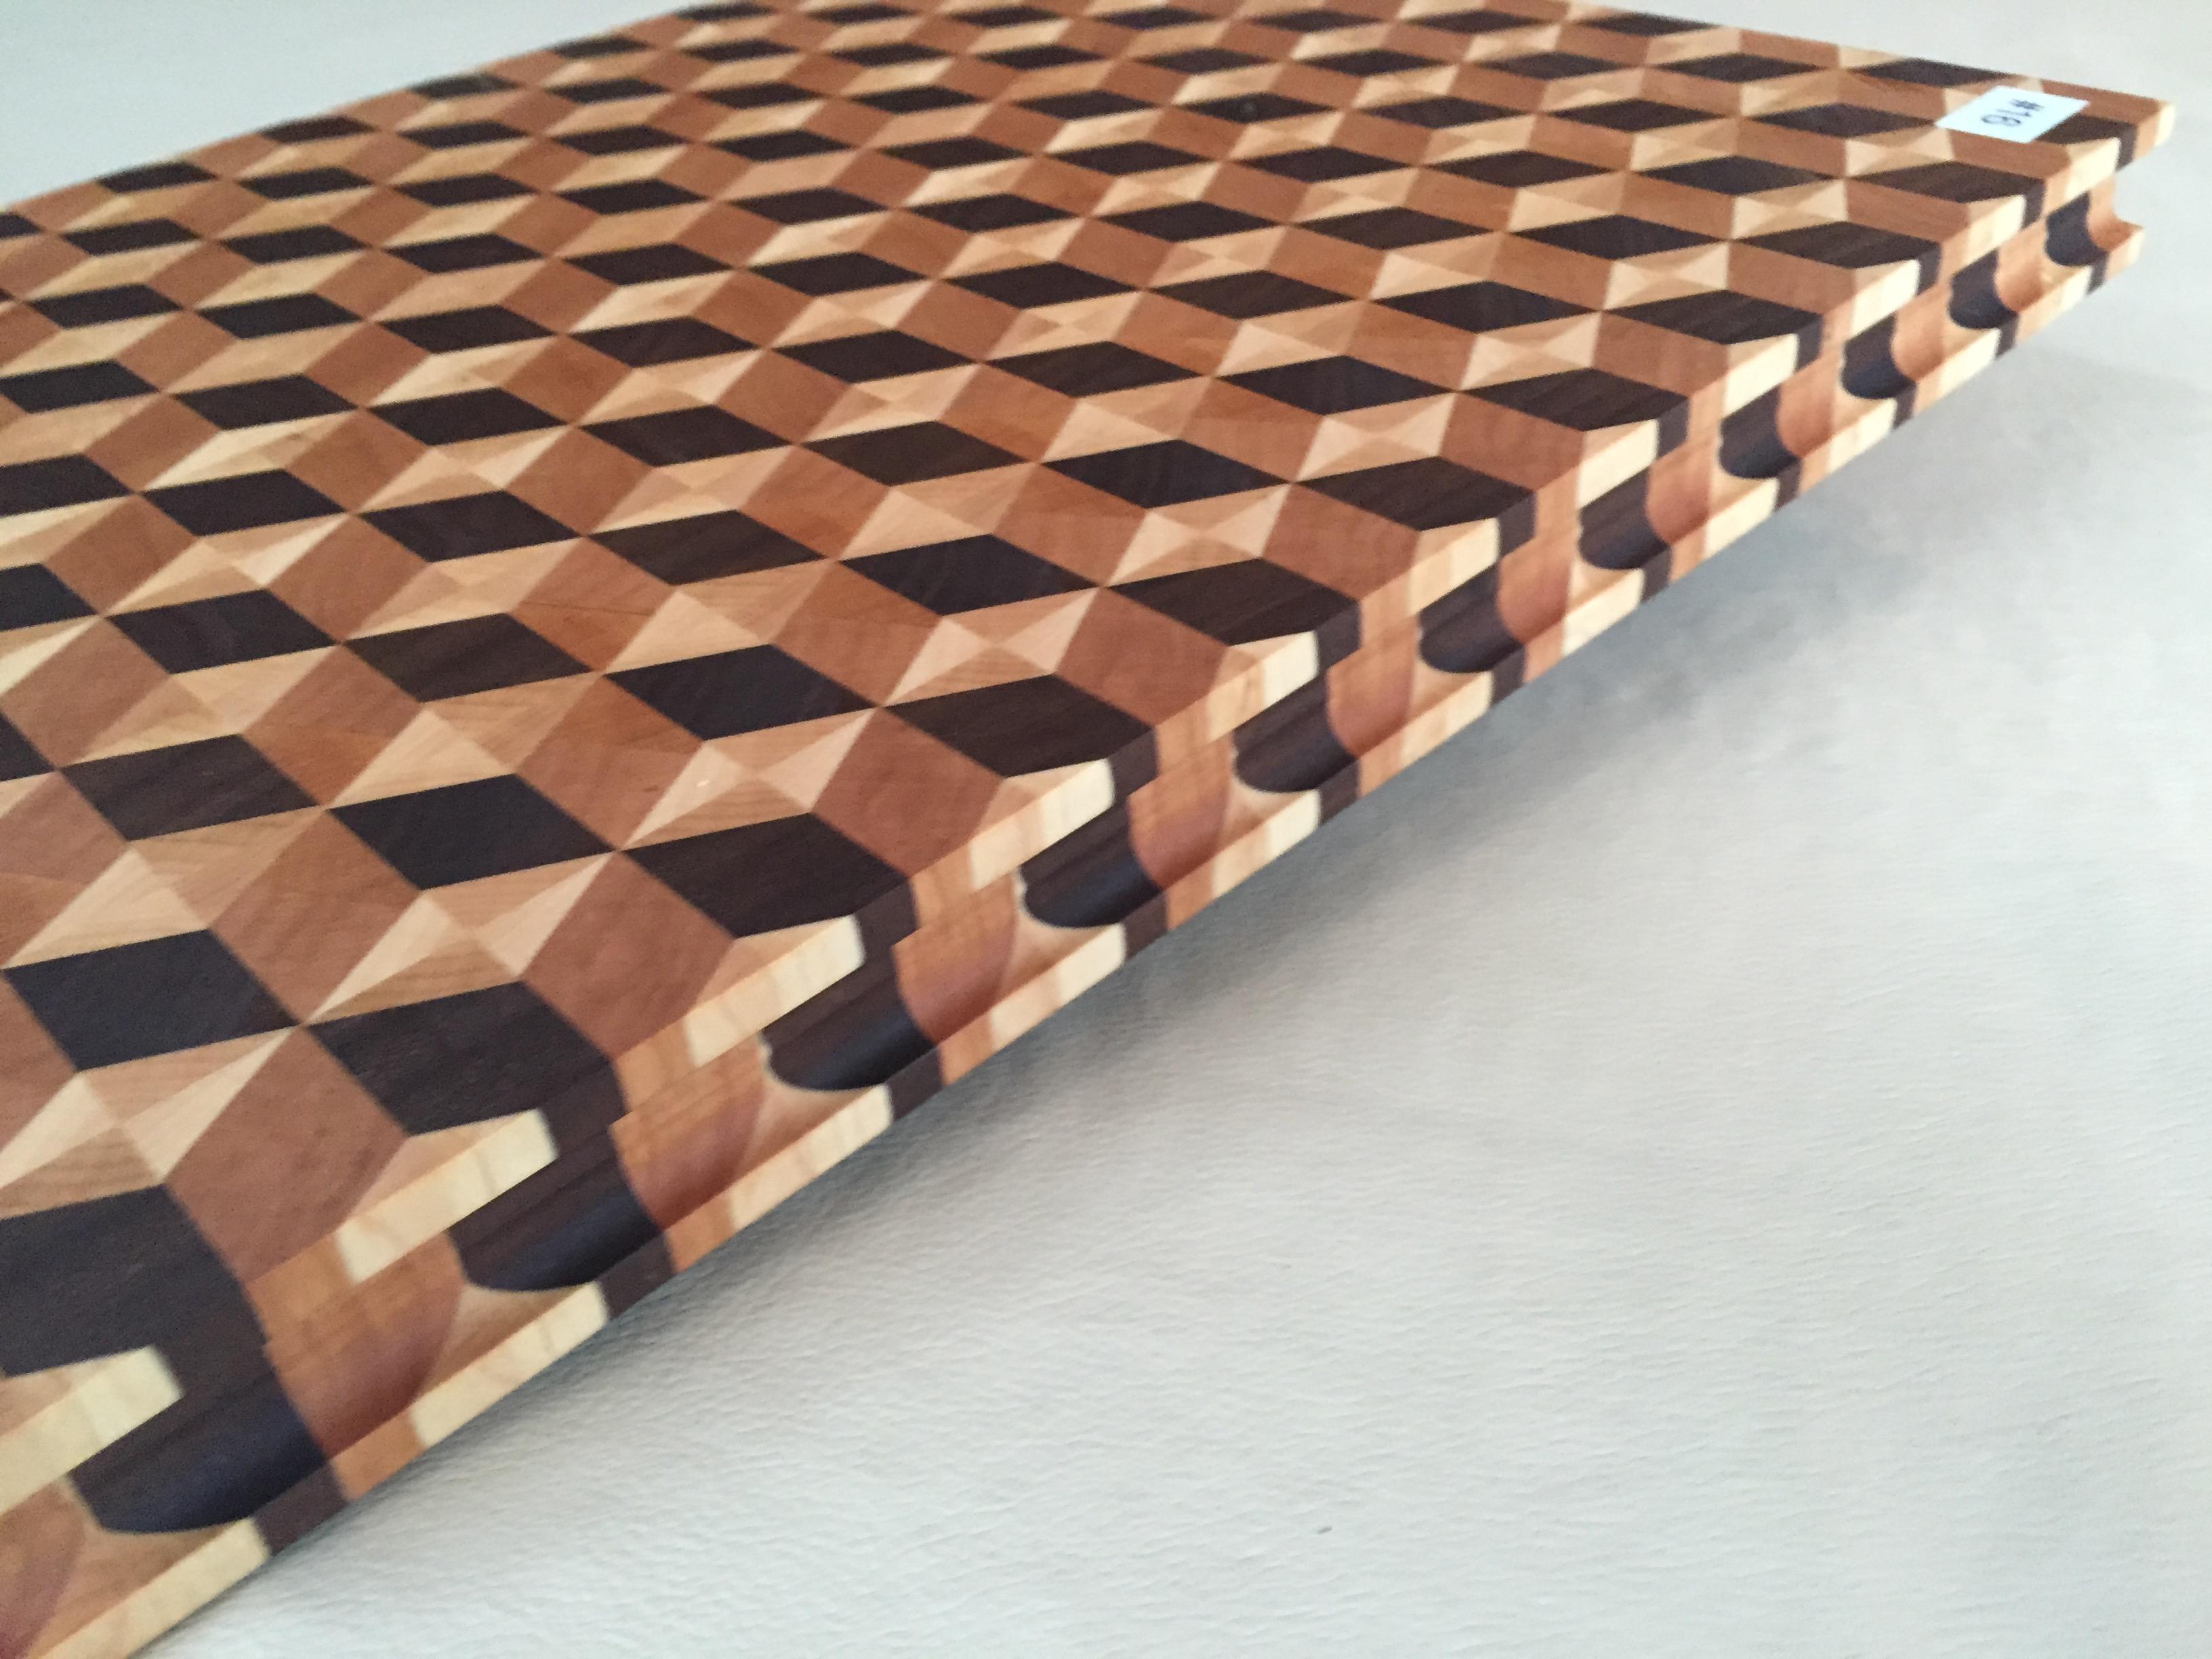 #16 Rectangular serving/cutting board 3D illusion